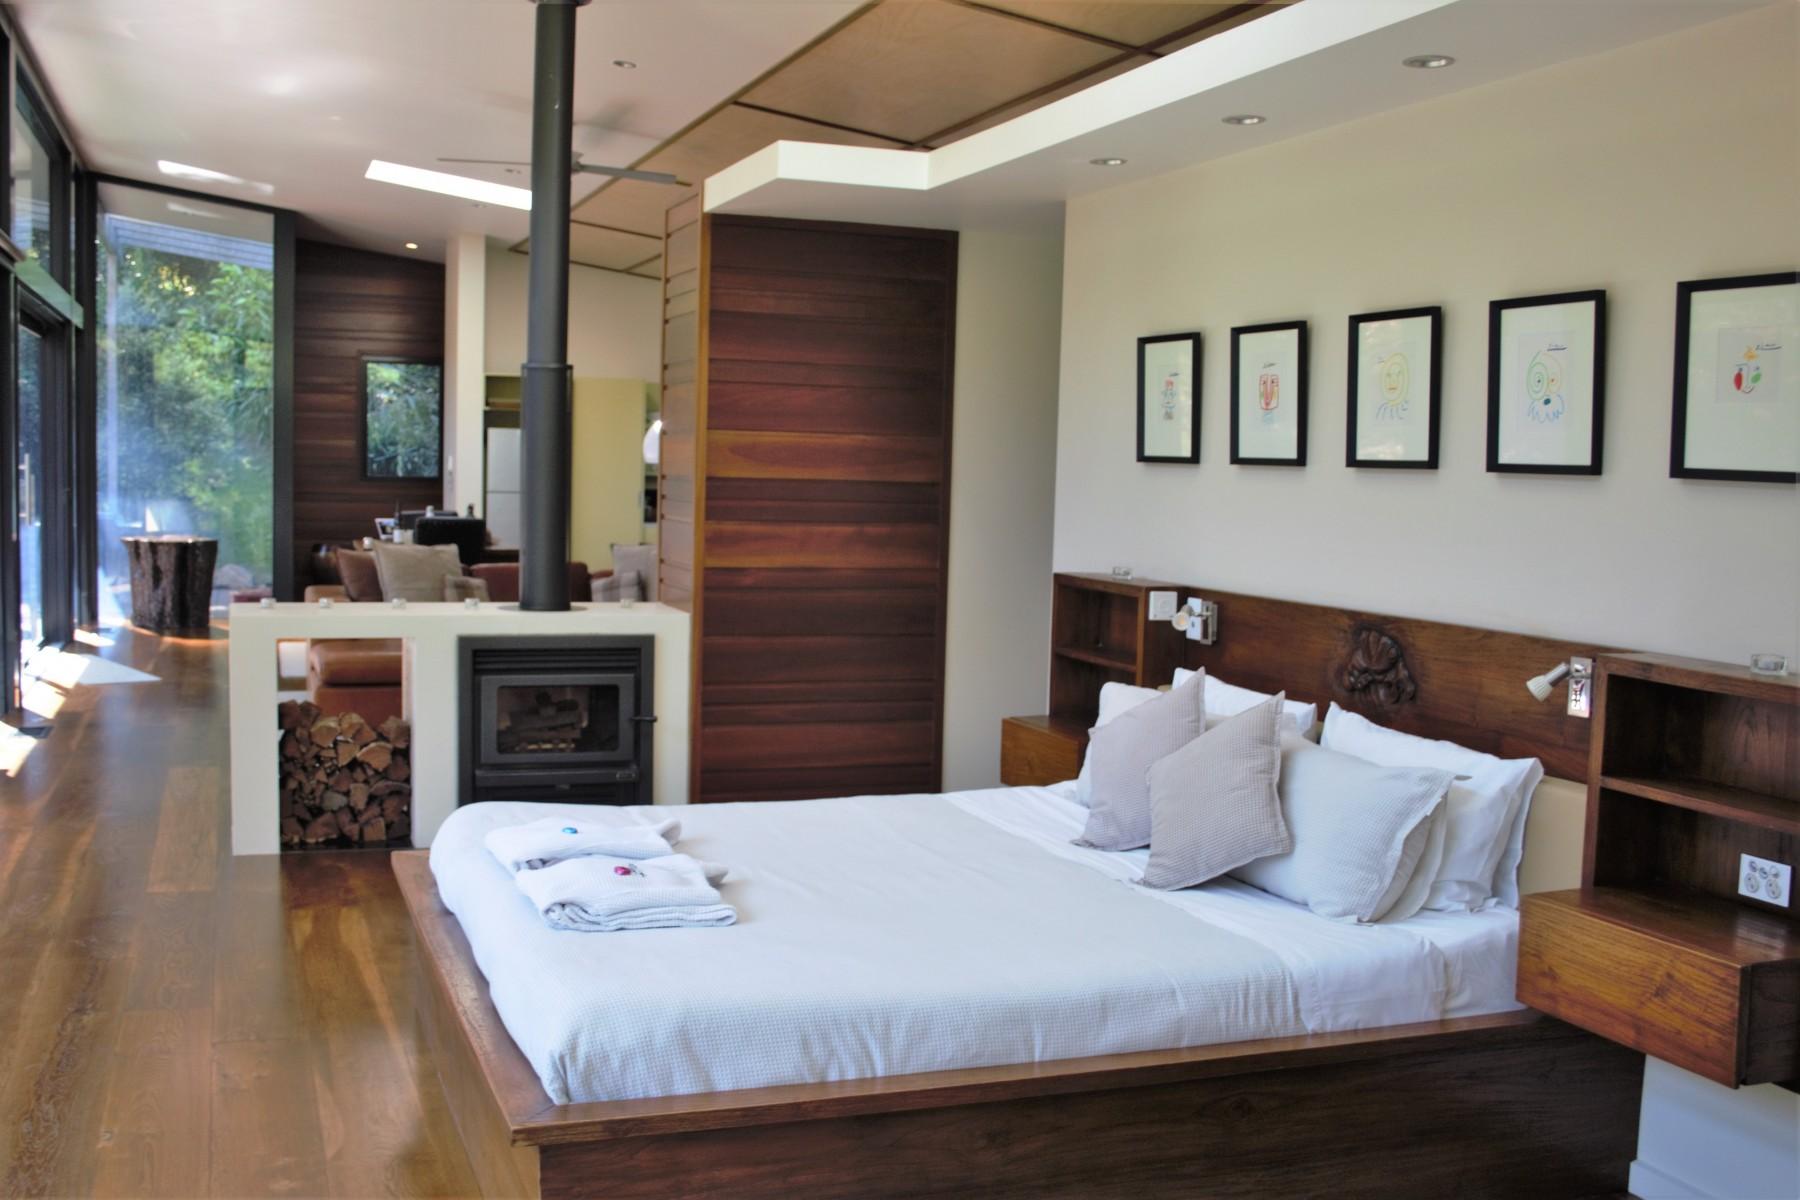 Crystal-Creek-Rainforest-Retreat-Lamington-Lodge-Bedroom-Fireplace.-Image-Kate-Webster